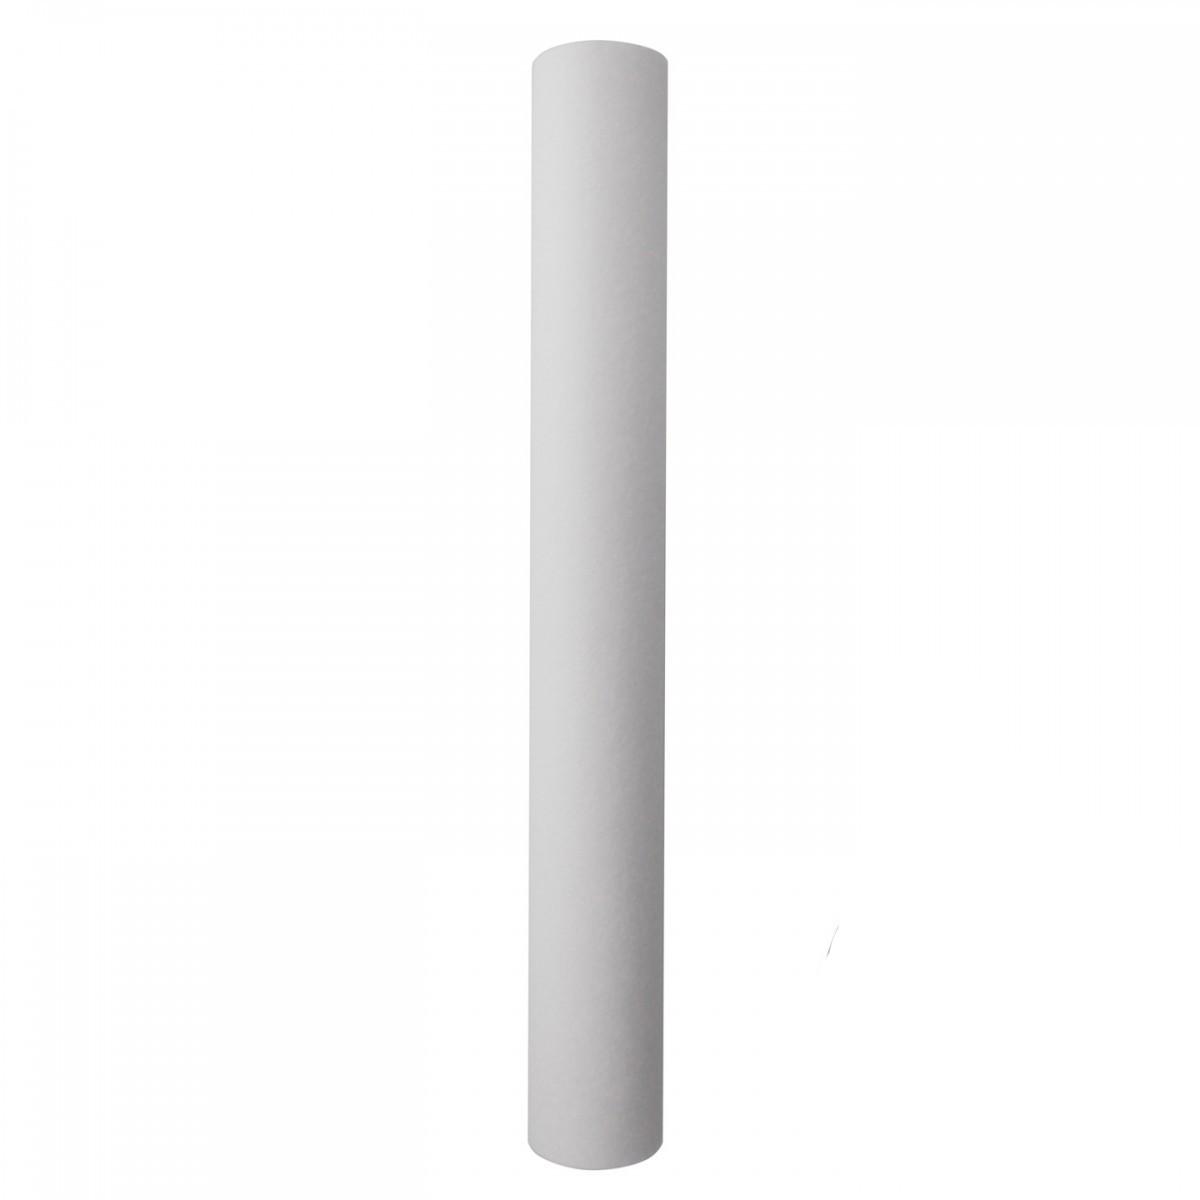 PS1-20 Elem Filtrante Polipropileno Liso Sem Acabamento; Encaixe 20' X 2.1/2' 01 Micra - 255691-43B